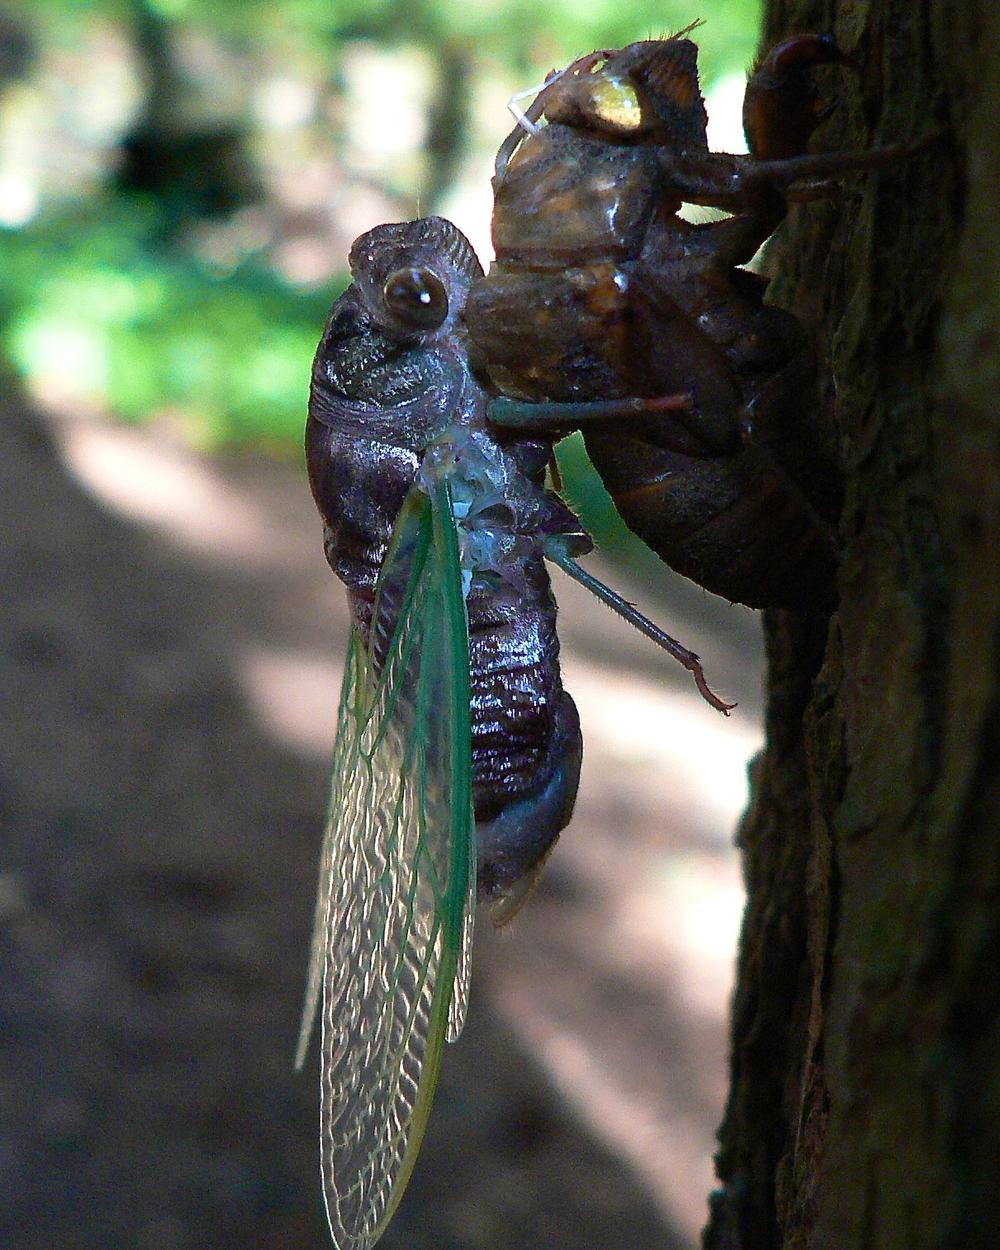 Just hatched cicada